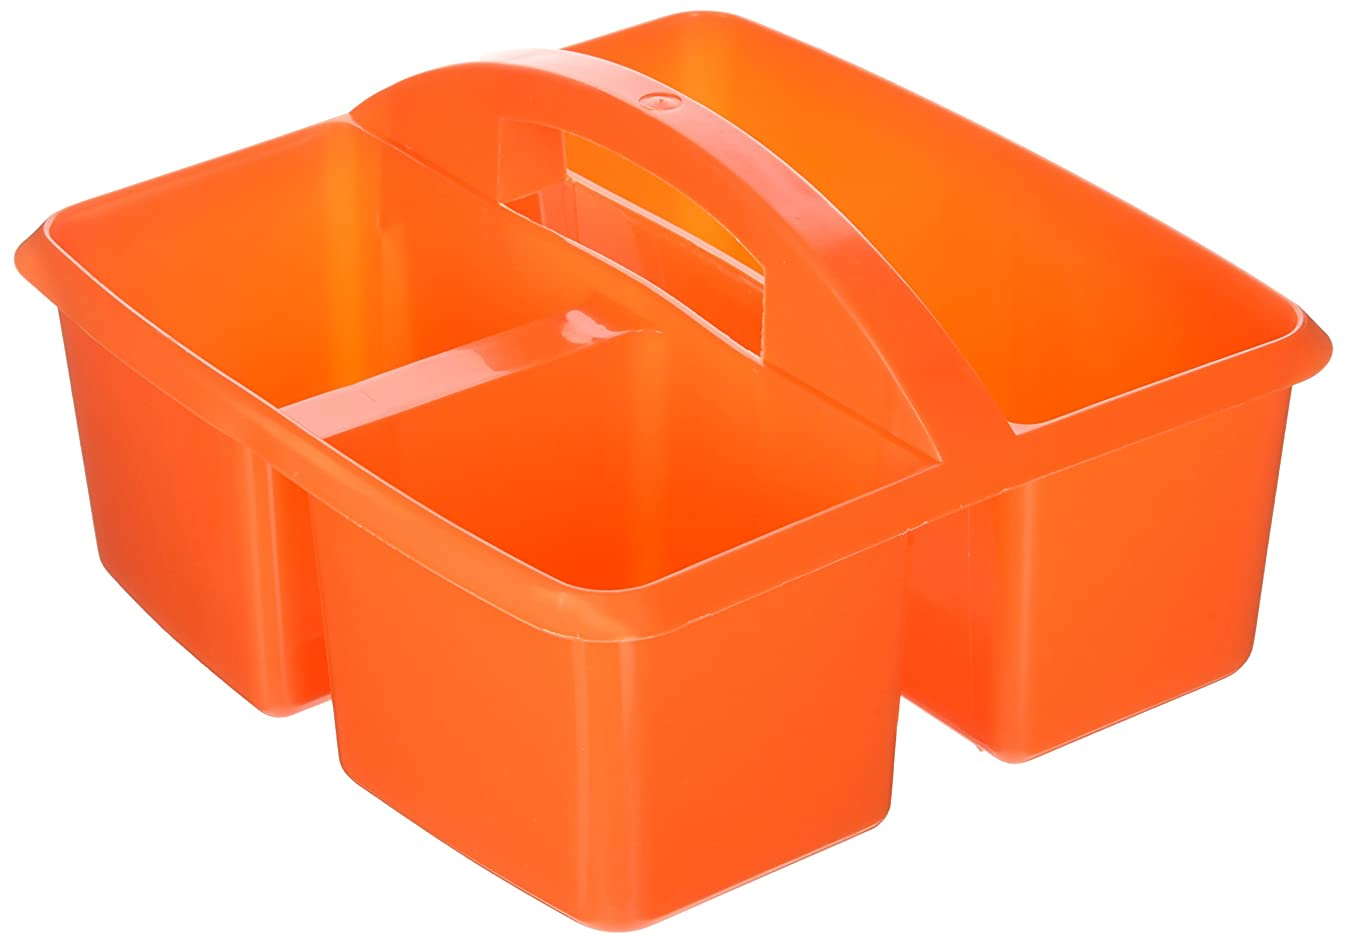 Small Utility Caddy Orange By Romanoff Products by Carson-Dellosa